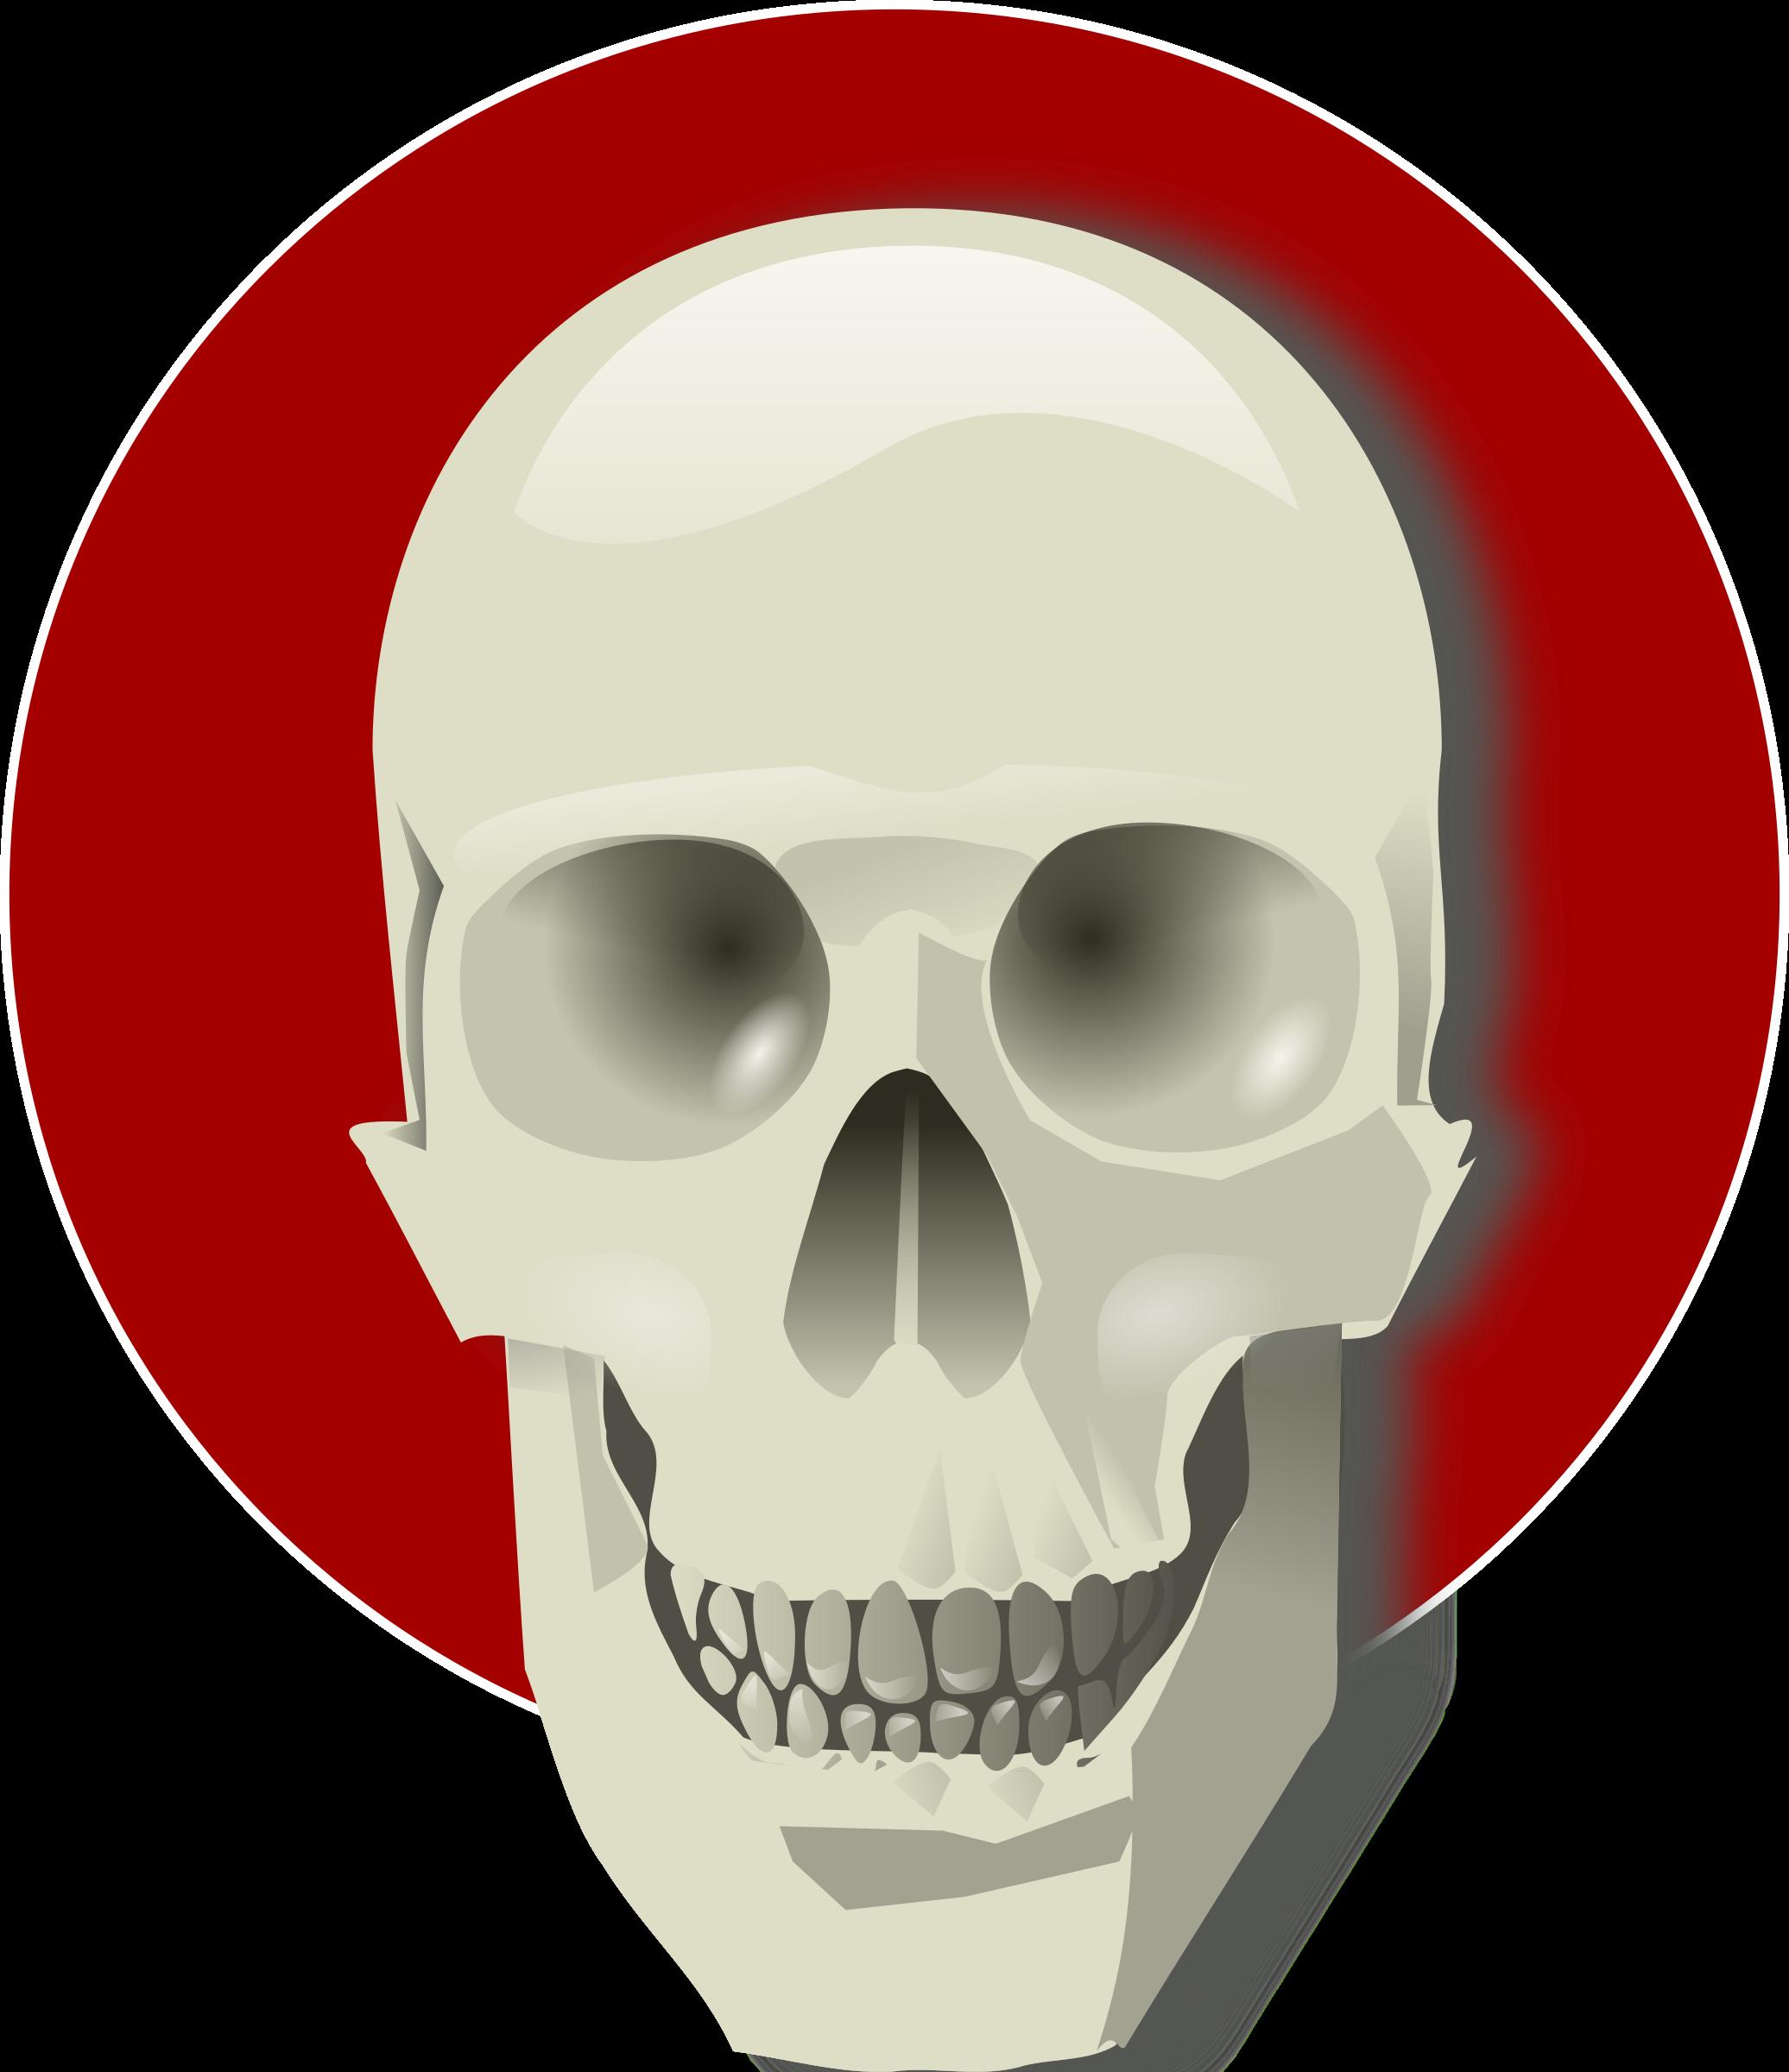 Human Skull By Rg1024